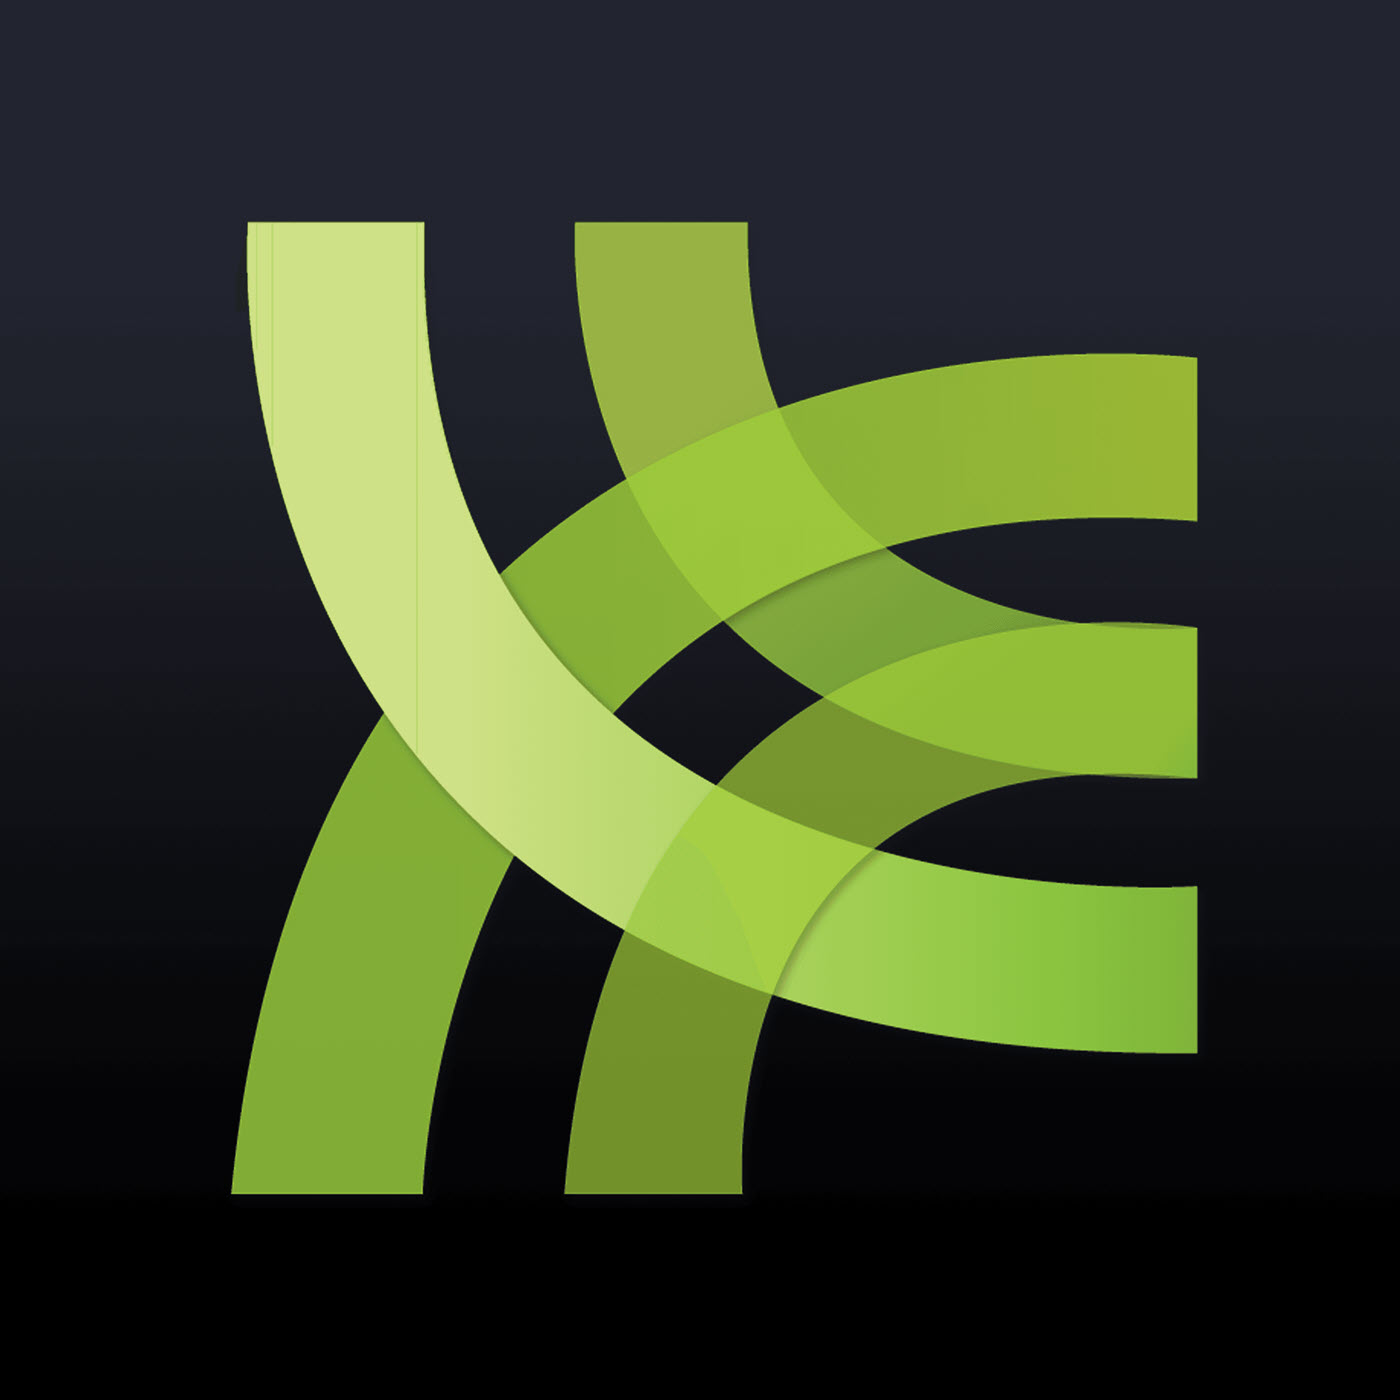 http://homedir-c.libsyn.com/podcasts/6e5f08376f13ebd918d2775c4e47b81b/48ac3512/zigziglar/images/Zig_photo.jpg